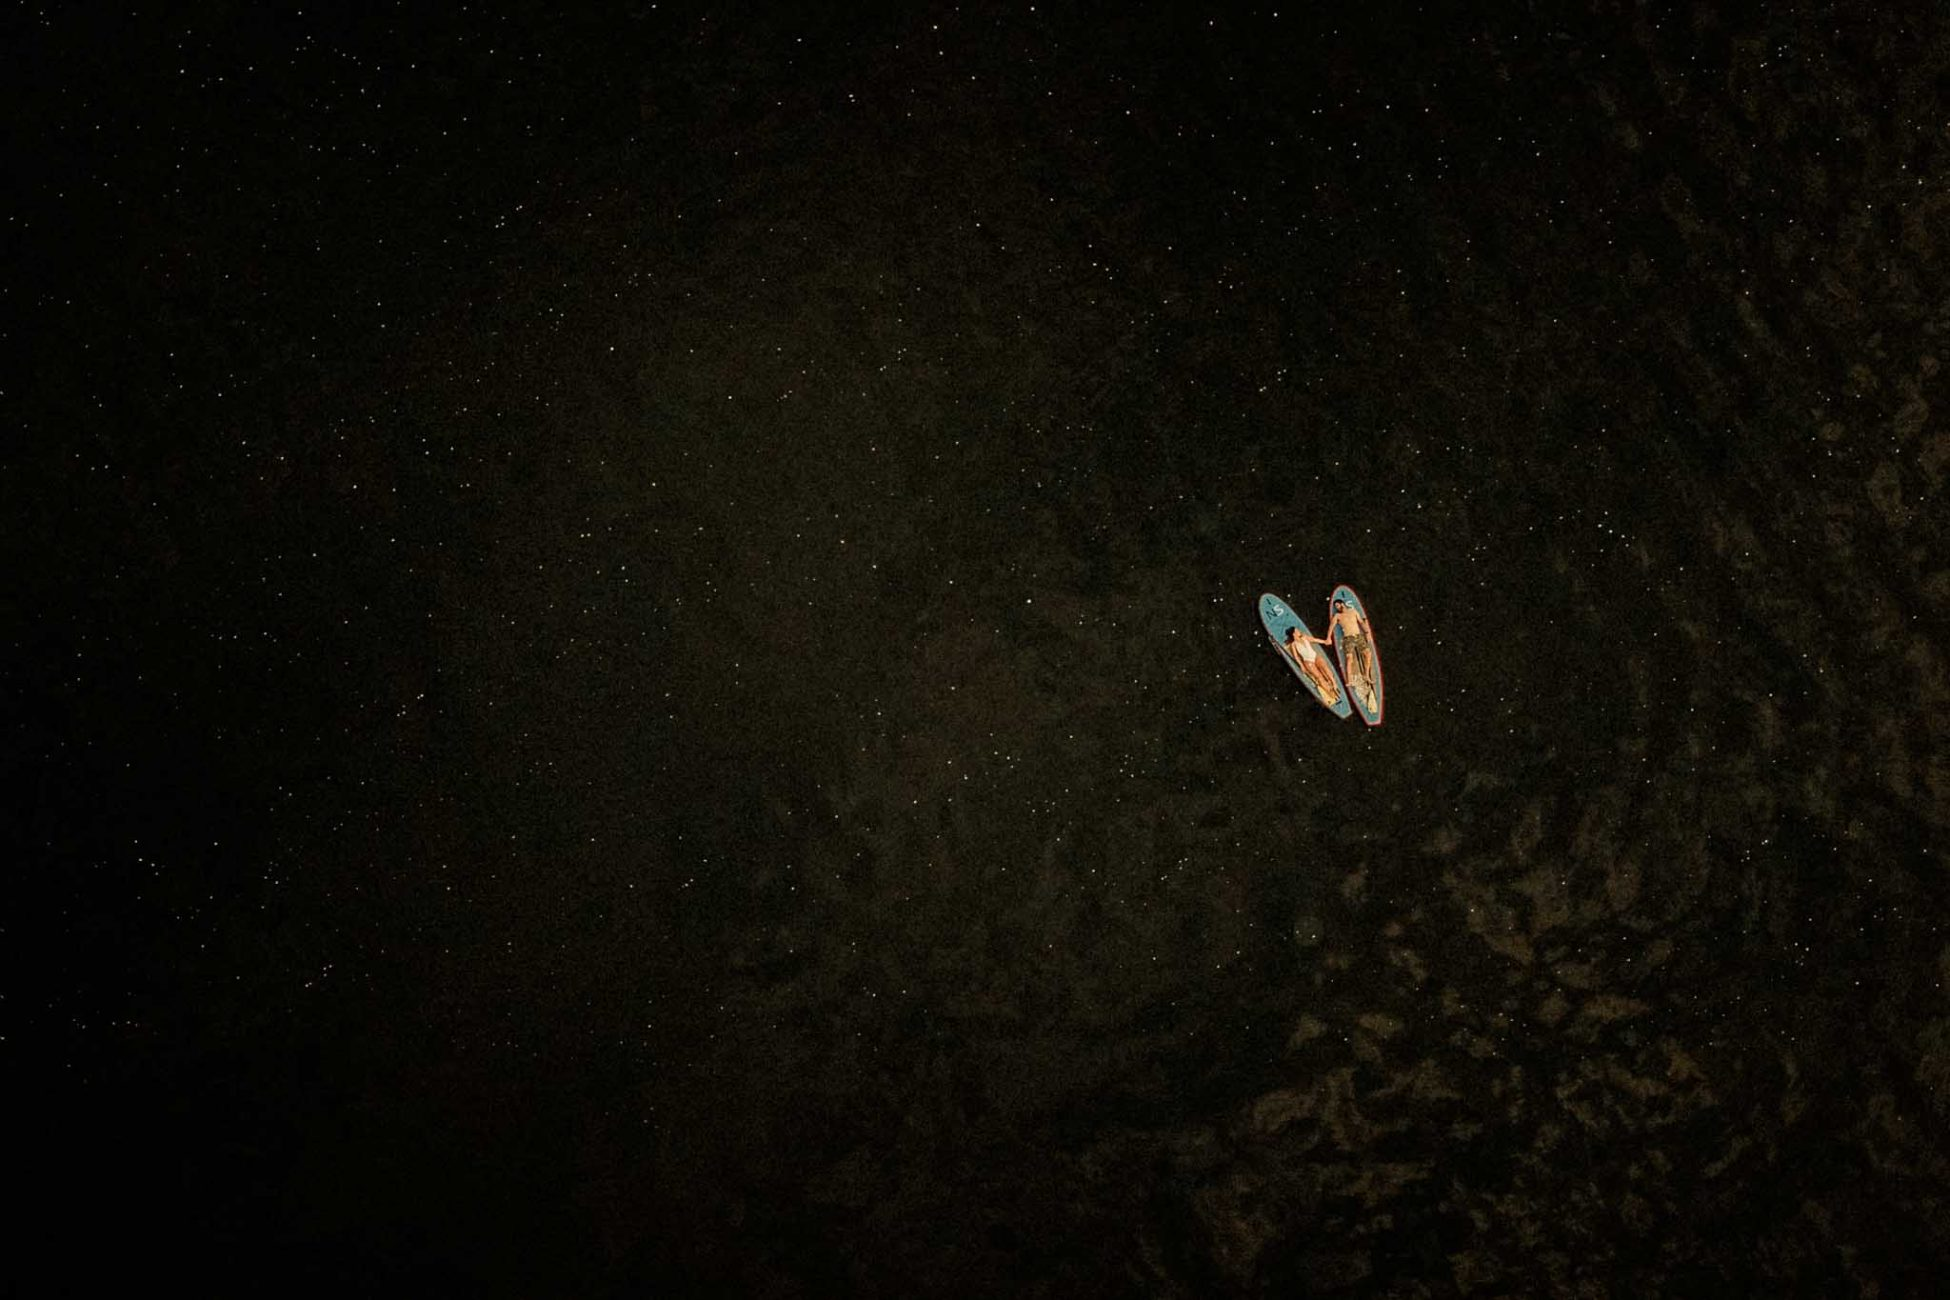 Paddle Board SUP Engagement Photograph taken on Canyon Lake Arizona by PNW photographer Dionne Kraus